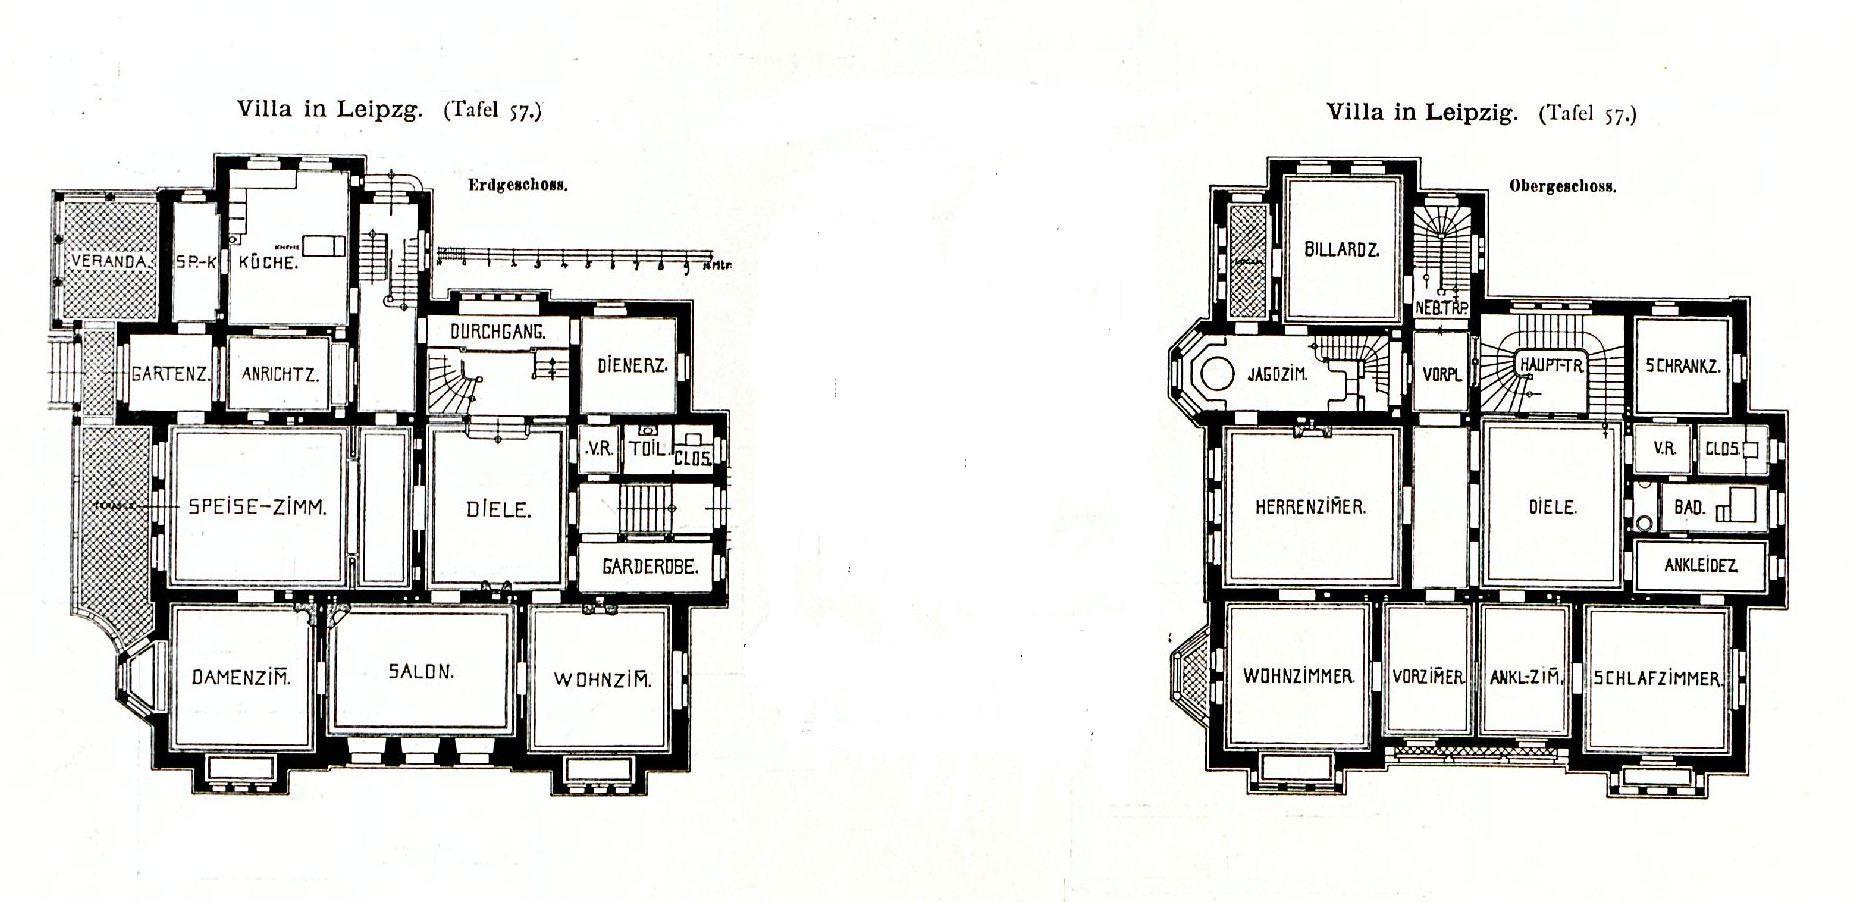 datei villa karl tauchnitzstrasse 10 leipzig architekt peter dypwad tafel 57 kick jahrgang. Black Bedroom Furniture Sets. Home Design Ideas